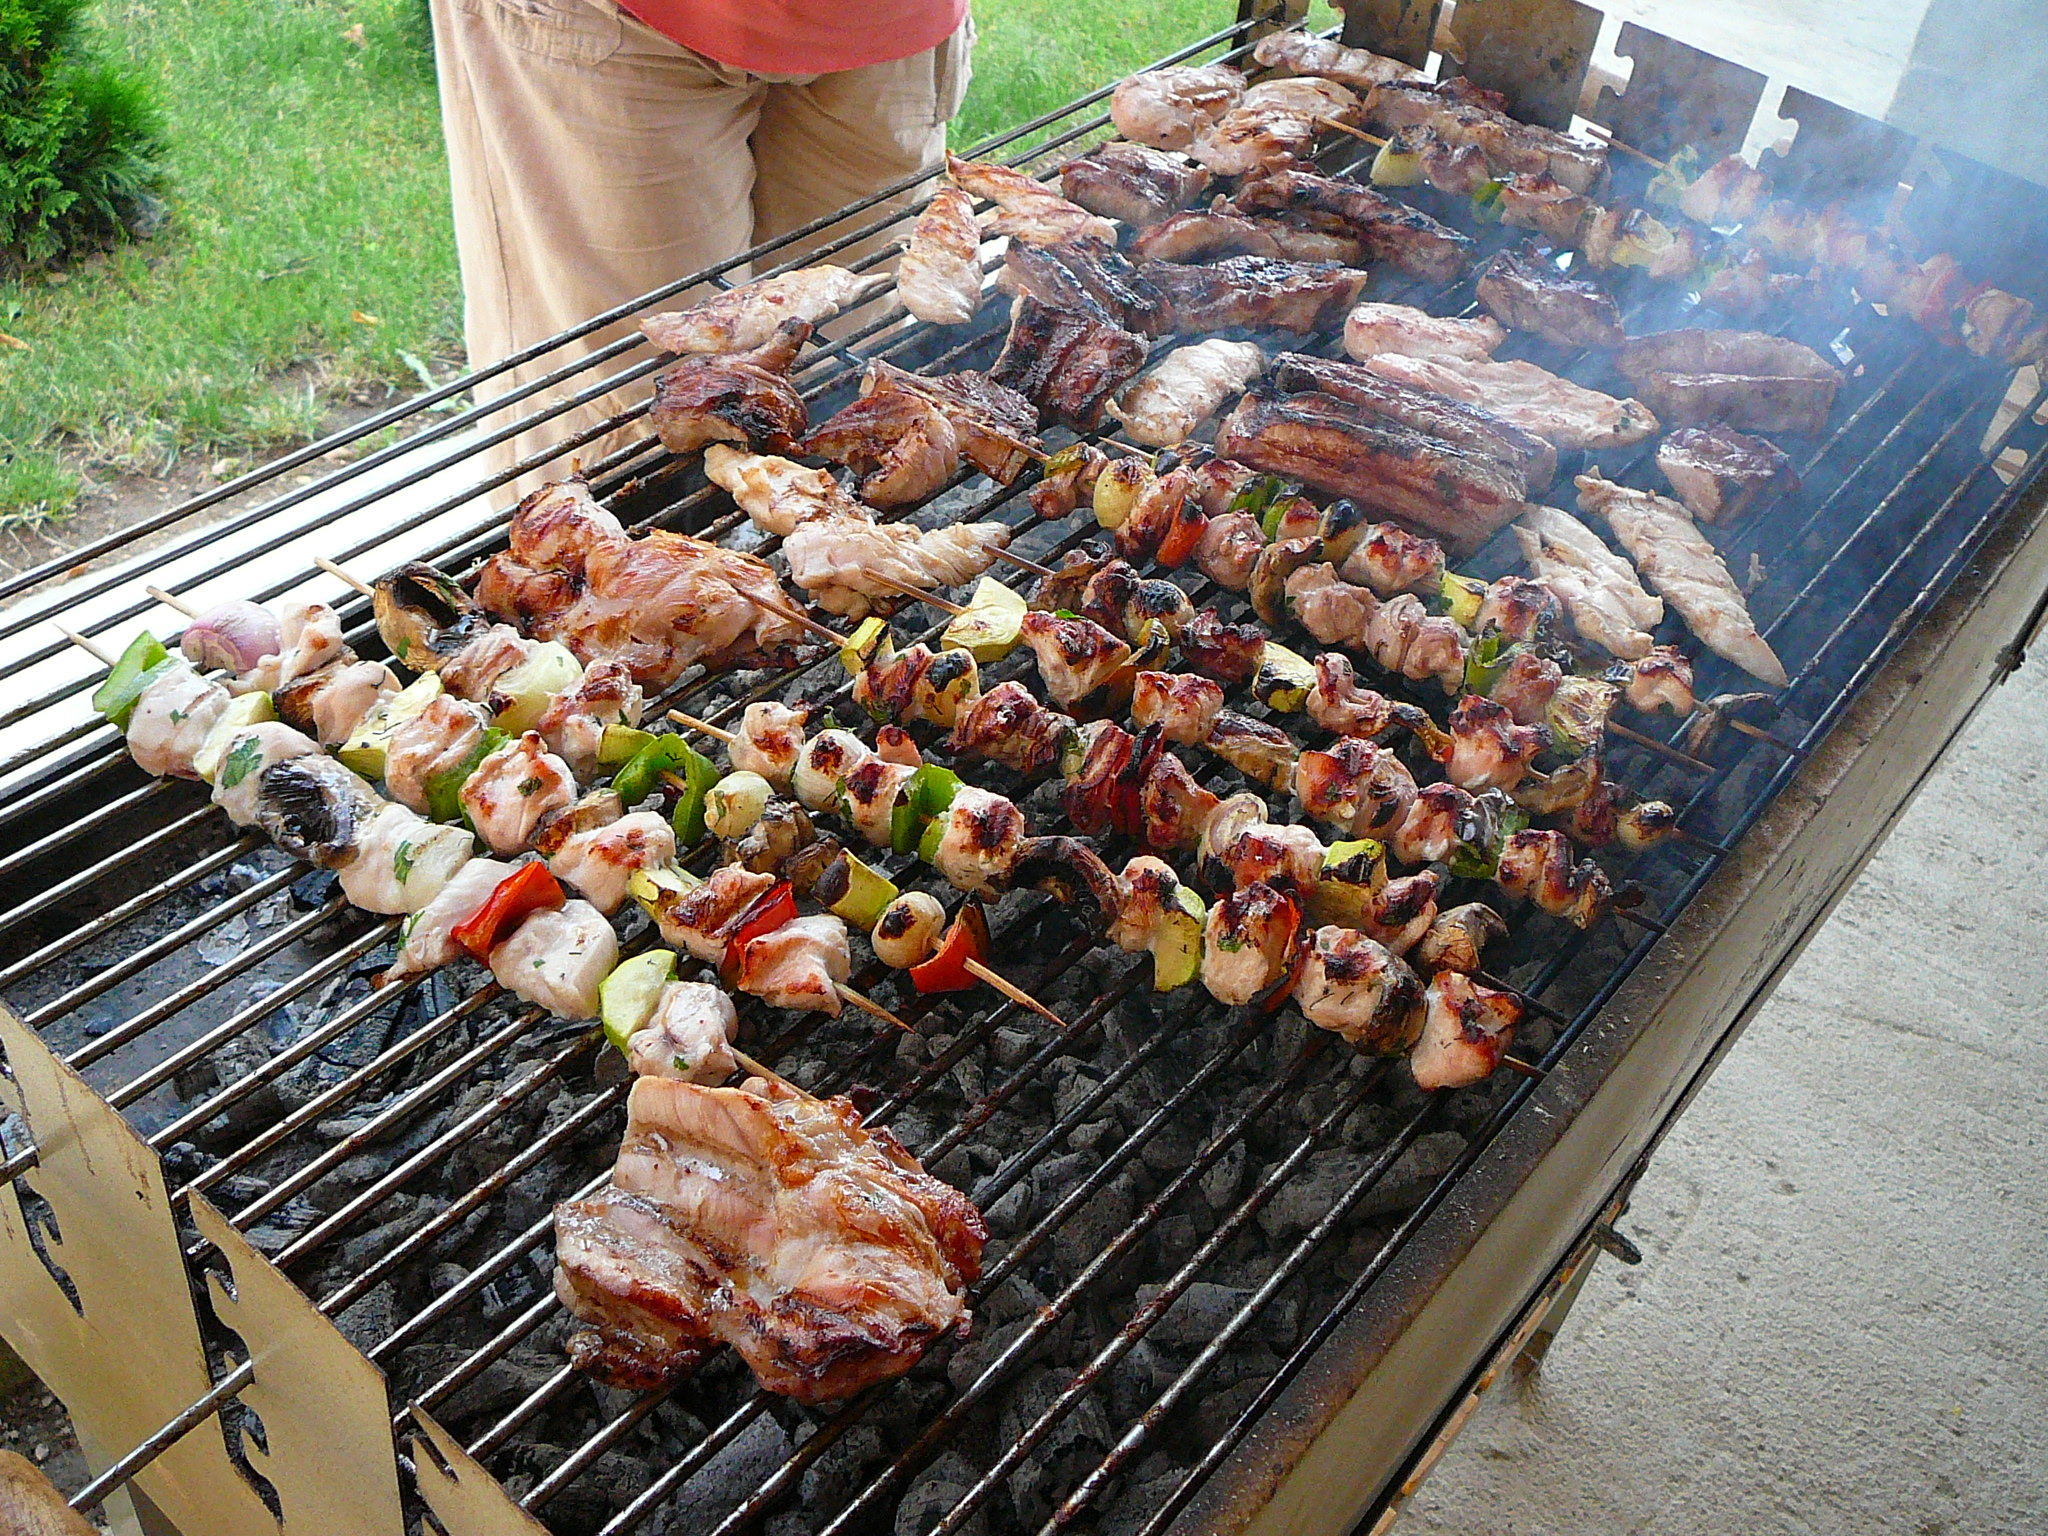 File:Bulgarian barbecue E1.jpg